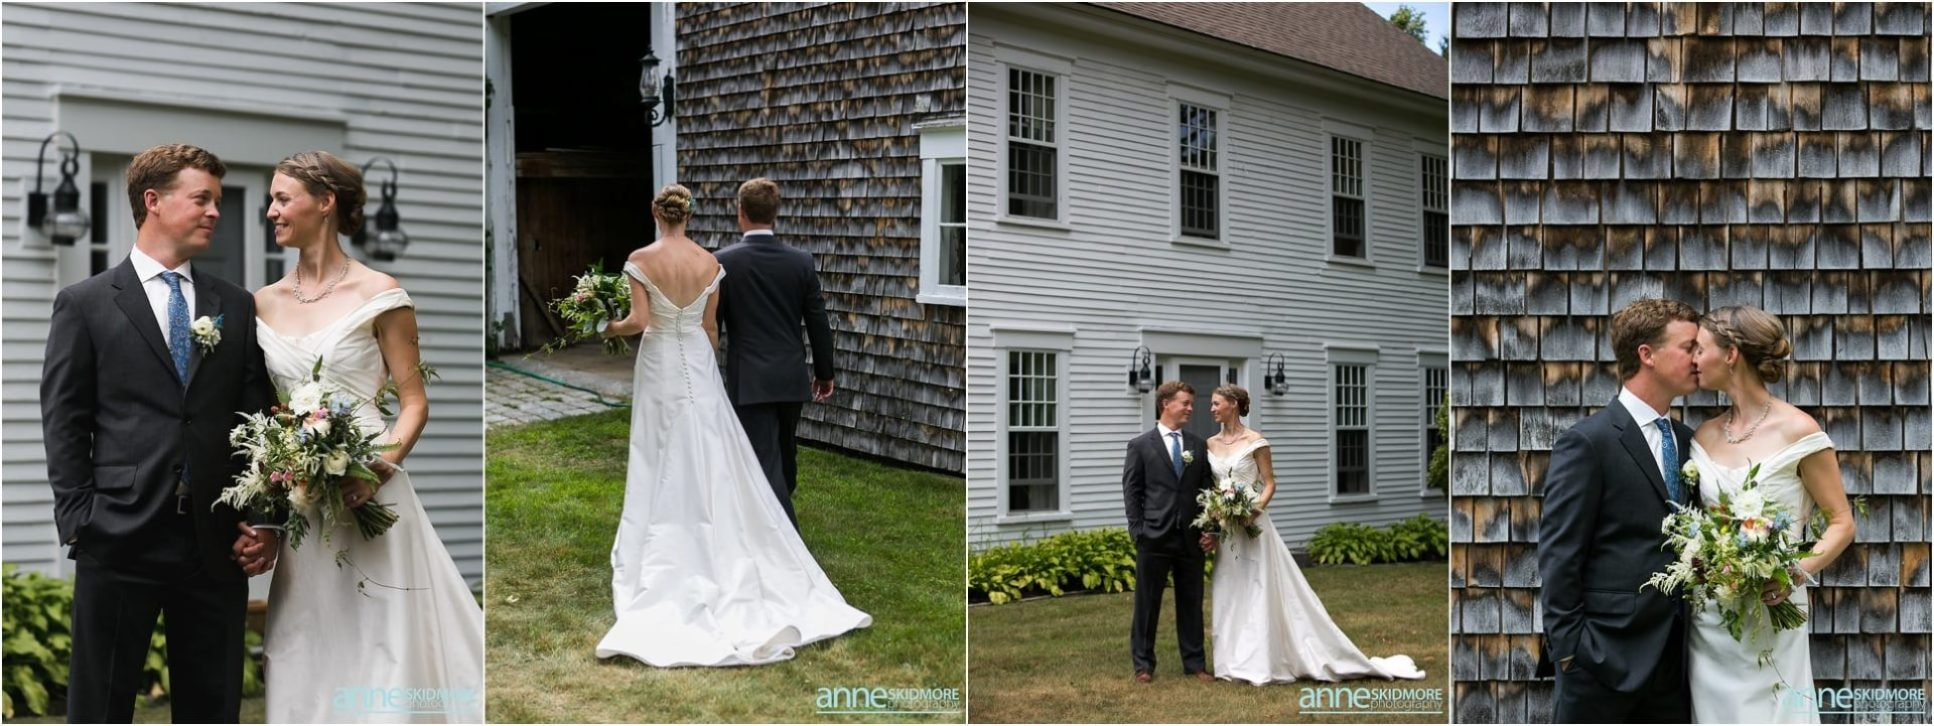 new_hampshire_wedding_photography_0030